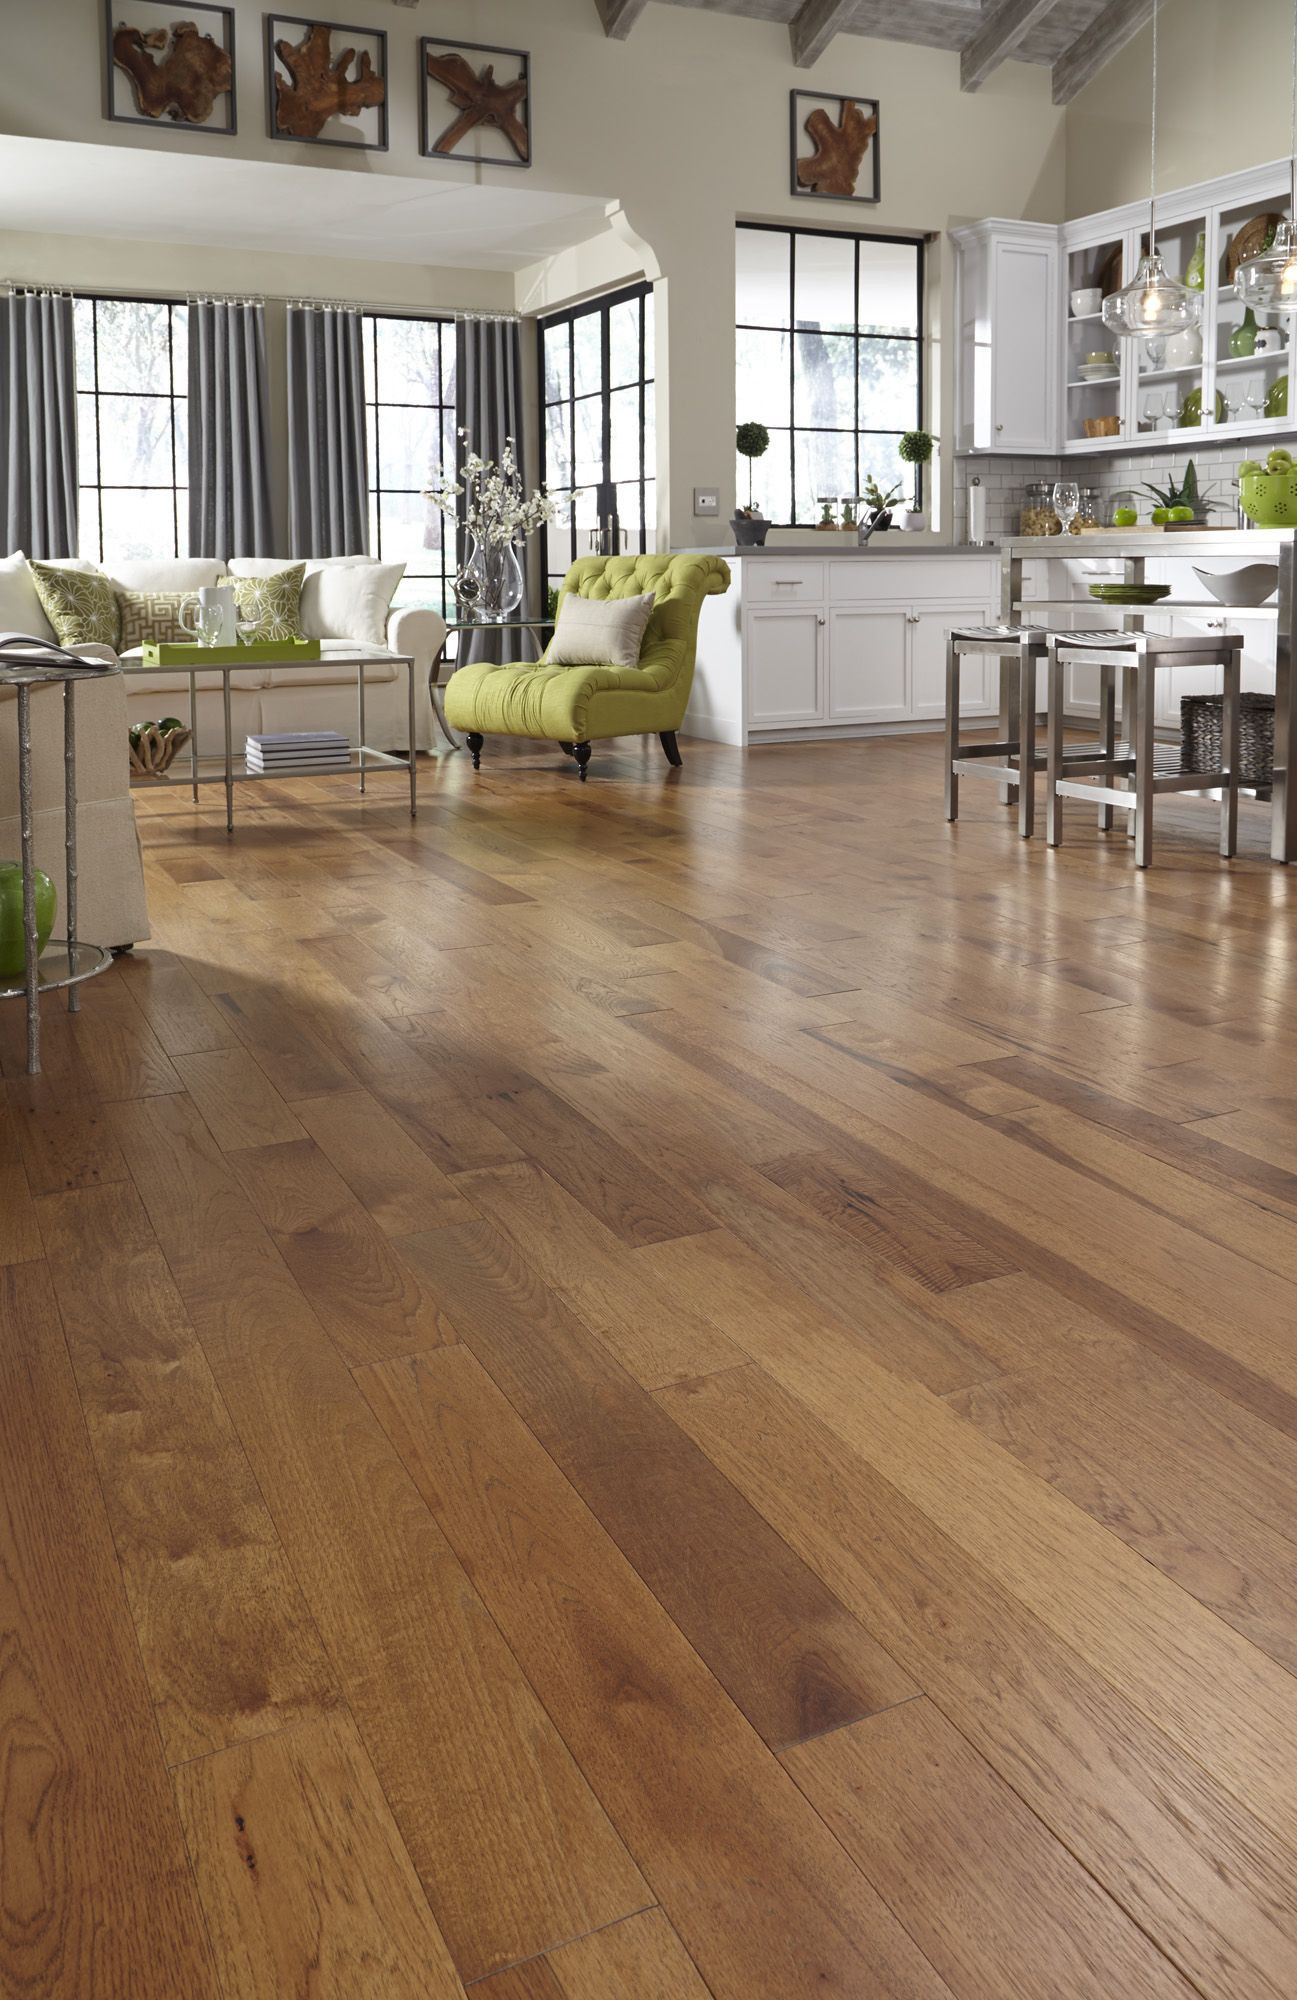 hickory hardwood flooring cheap of lumber liquidators laminate flooring and elegant capture the charm throughout lumber liquidators laminate flooring and elegant capture the charm of a country cottage with sugar mill hickory